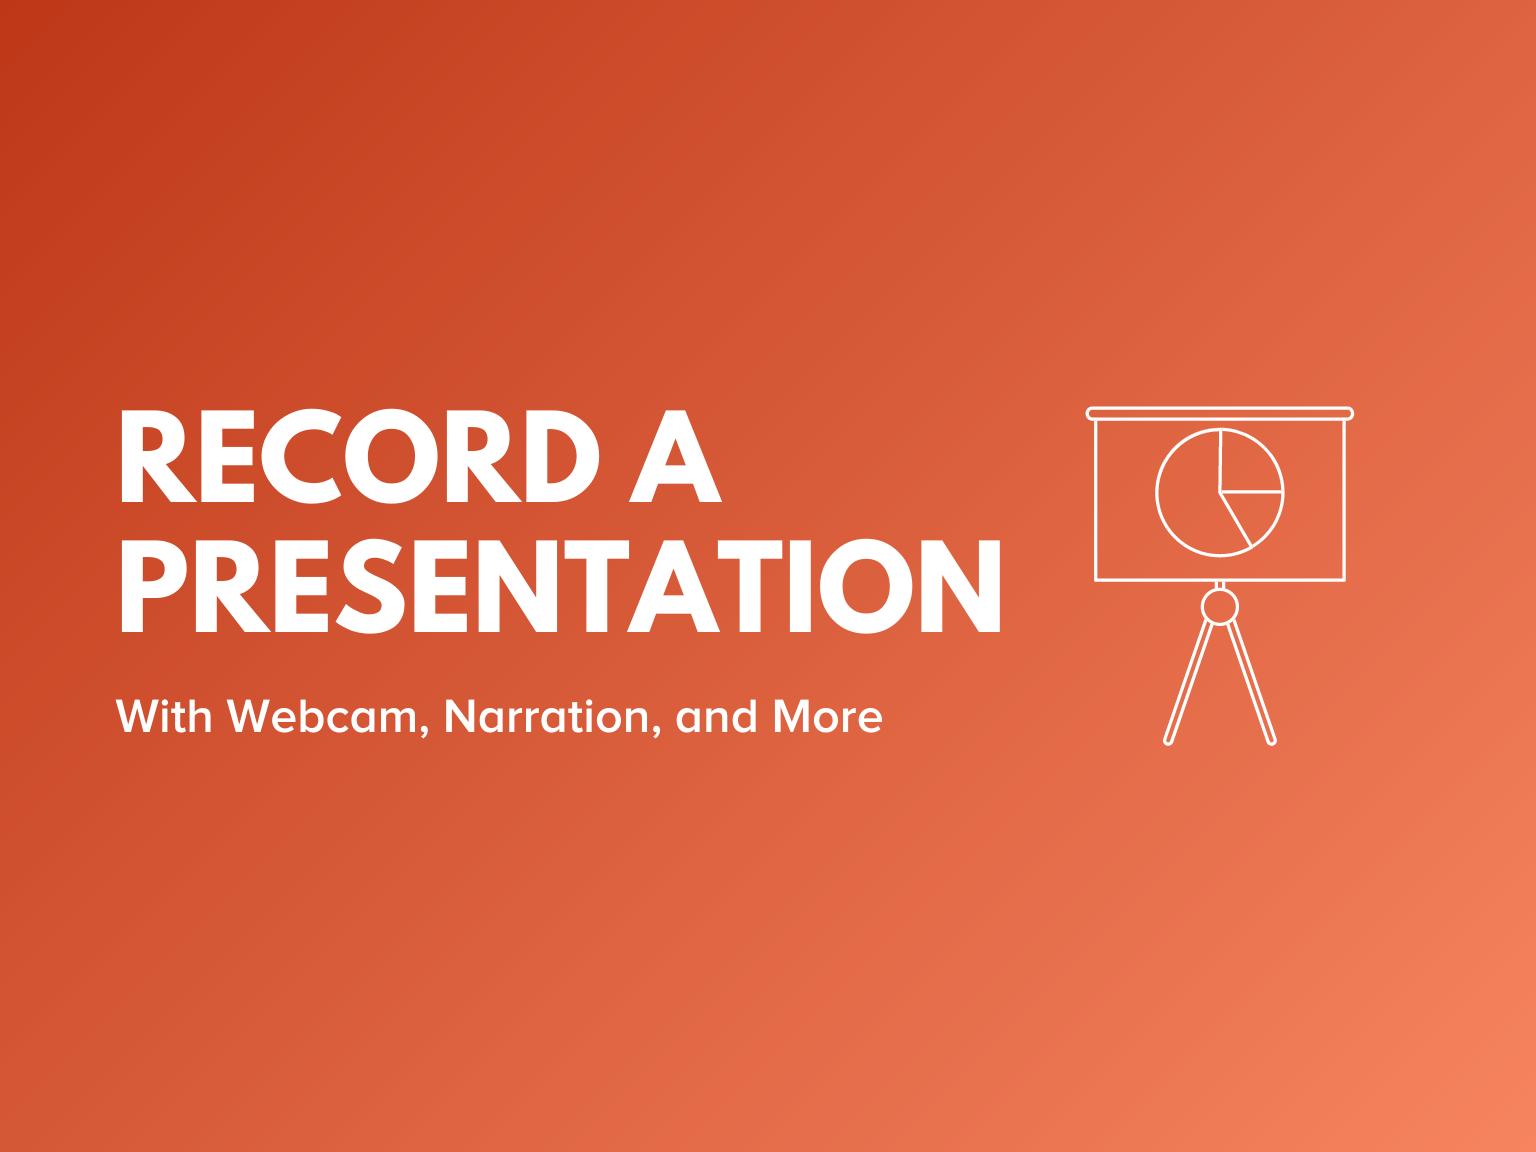 record presentation video header